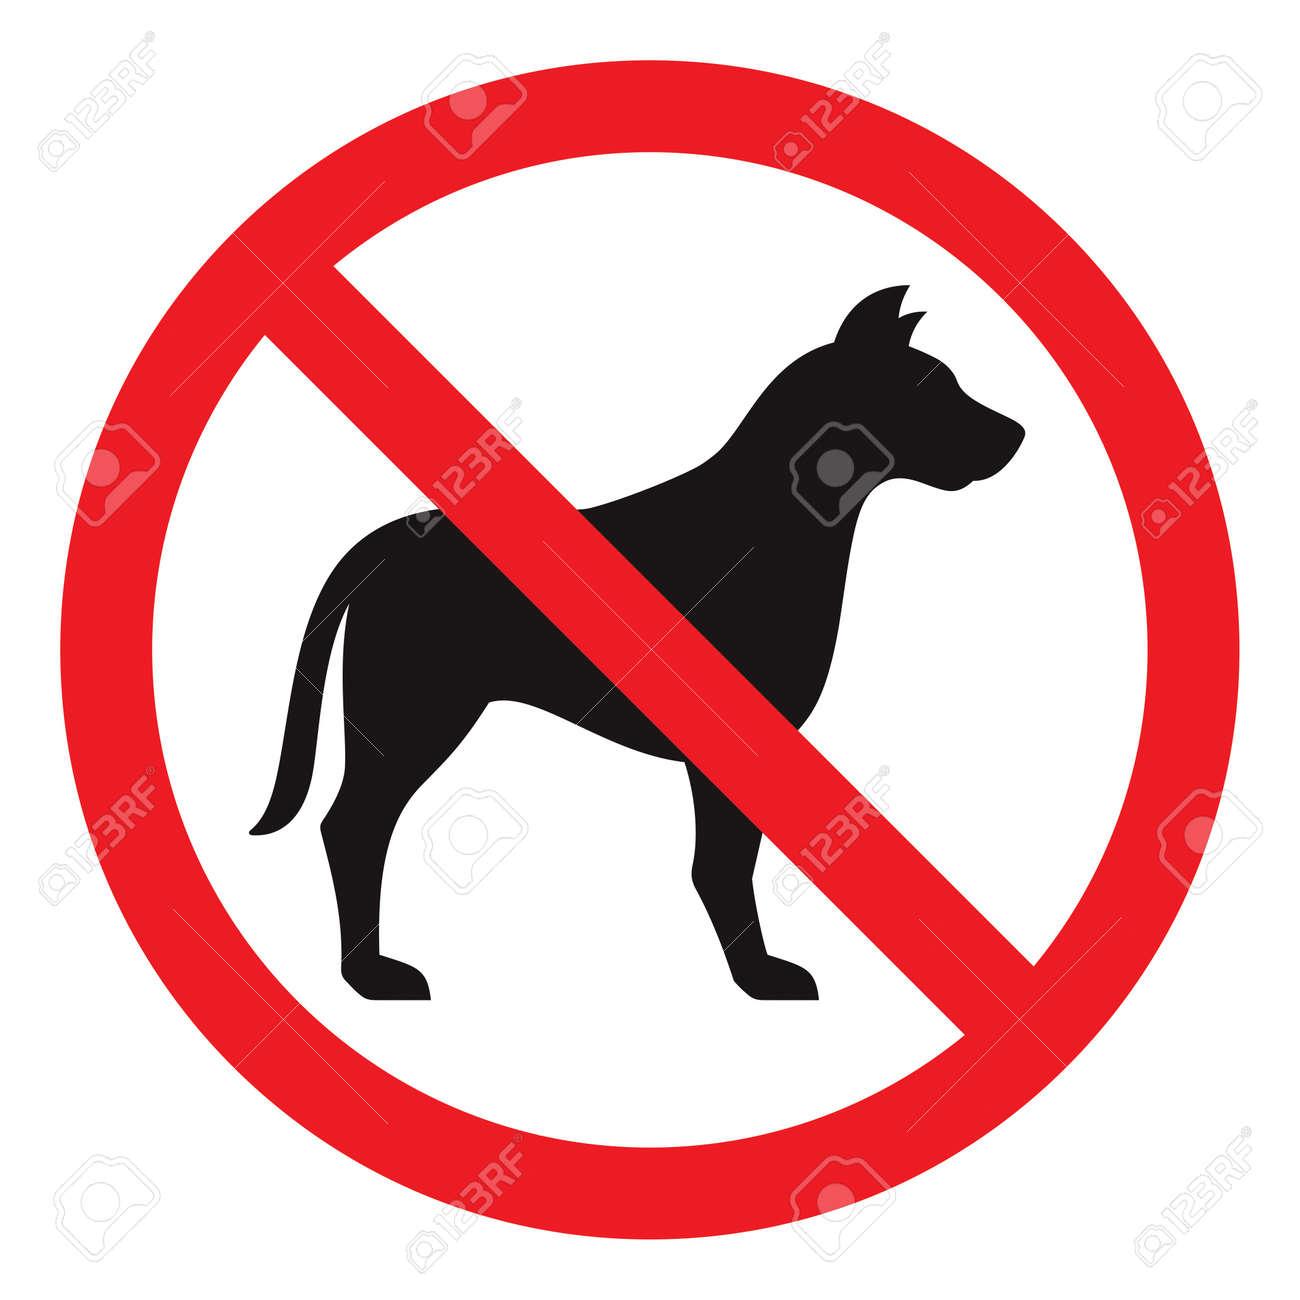 No dog sign, vector illustration - 21781387